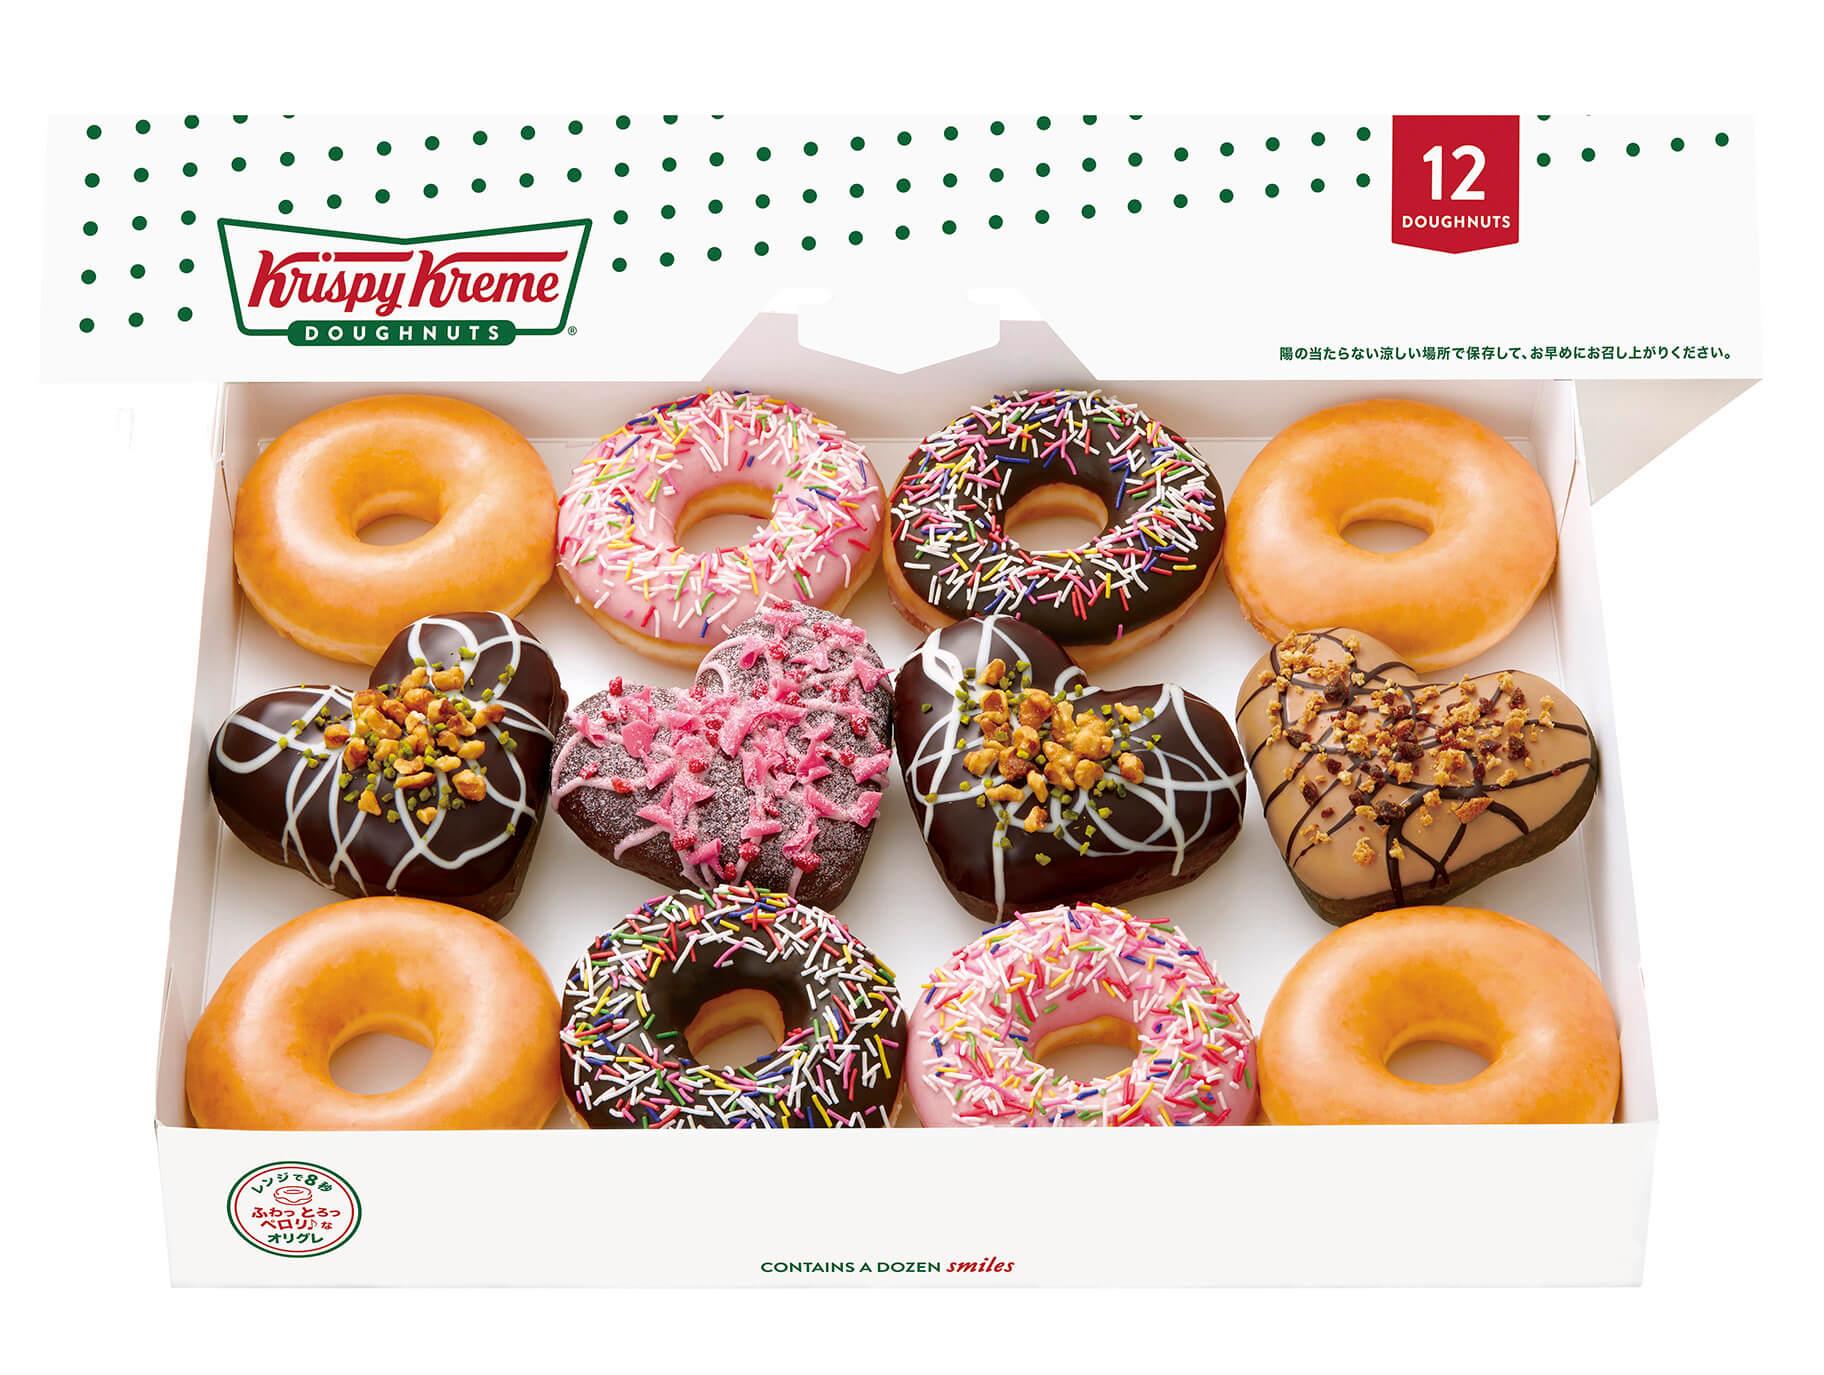 Krispy Kreme Doughnuts推出三種心型「翻糖甜甜圈」情人節限定販售 krispykremedoughnuts、情人節、